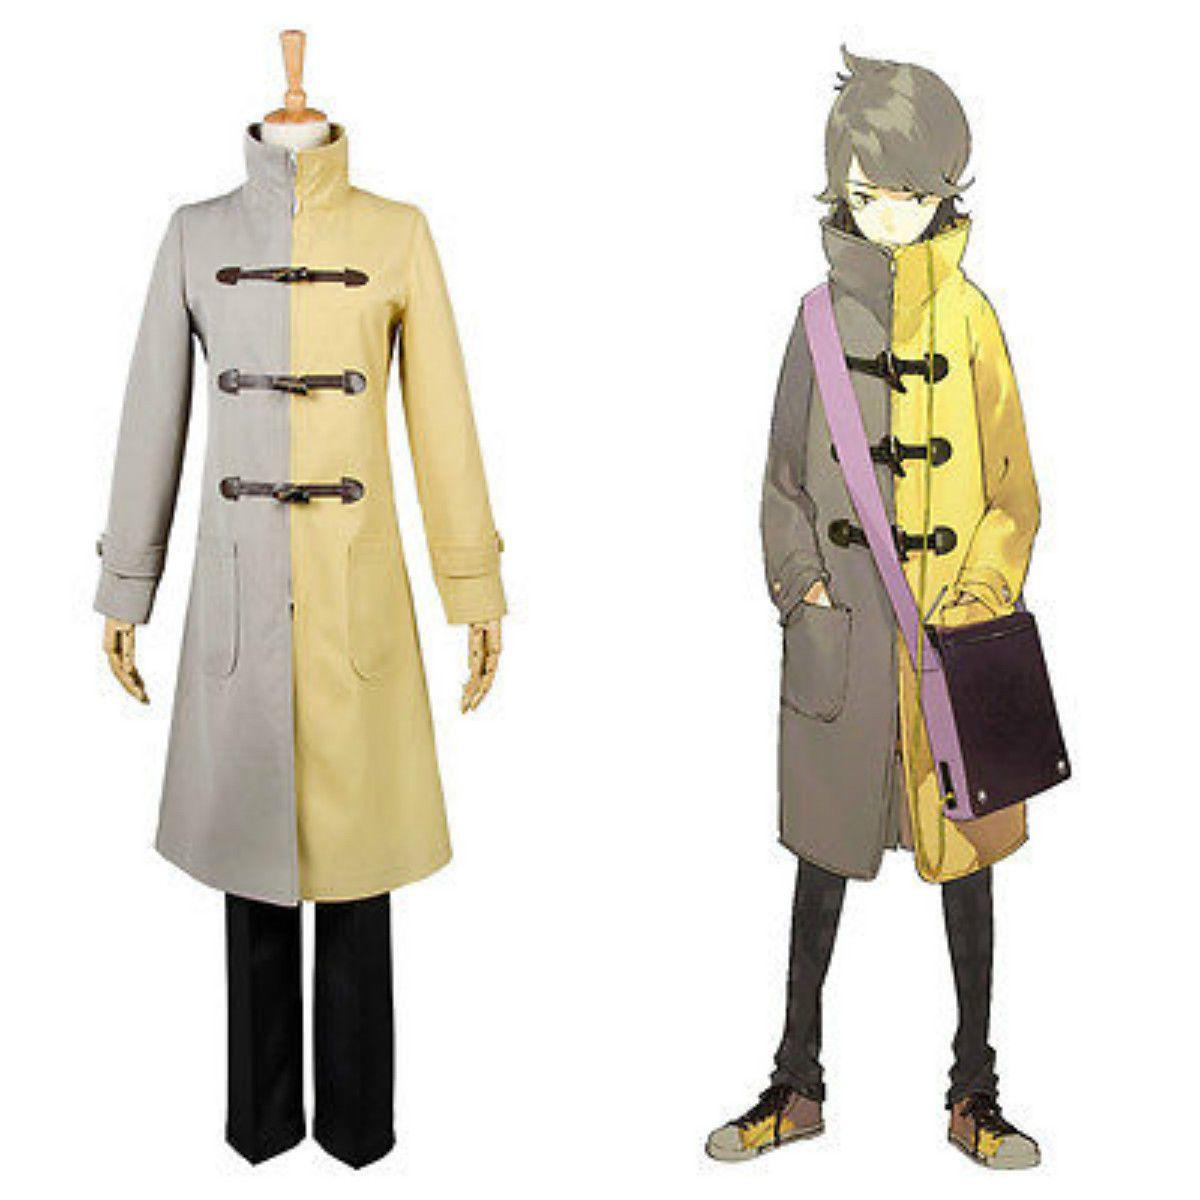 Détails sur Occultic; Nine 9 Costume Yuta Costume Yuta Gamon Manteau Cosplay